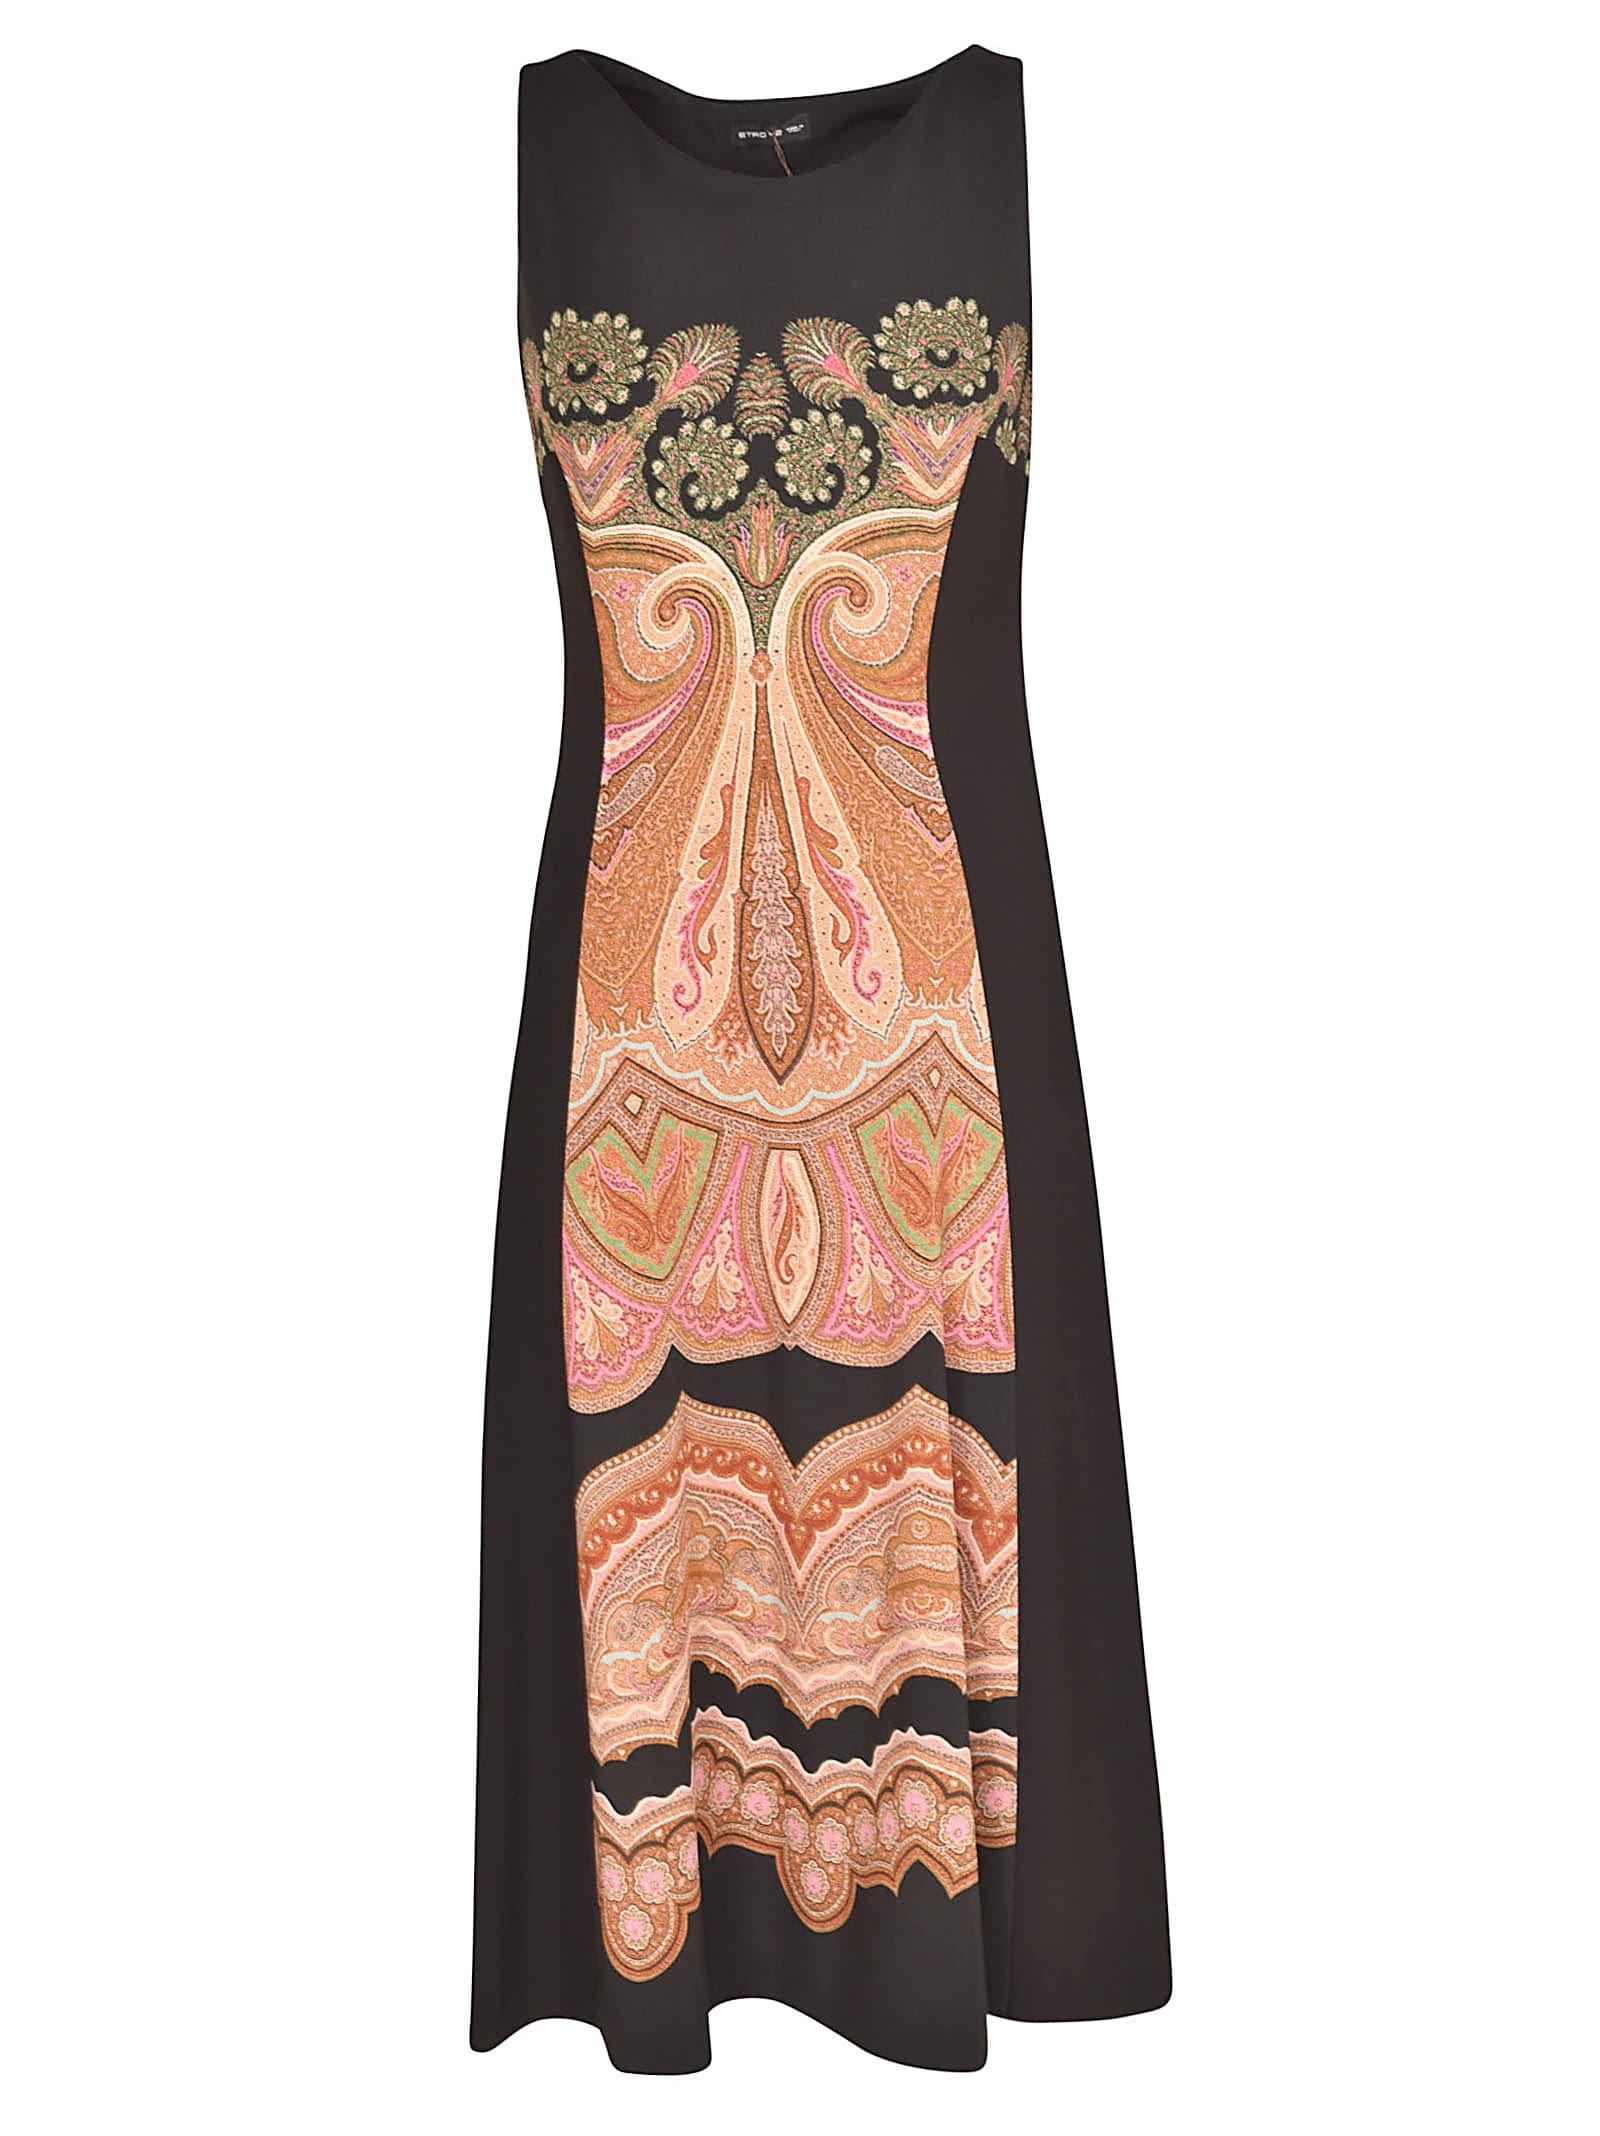 Etro Sleeveless Dress